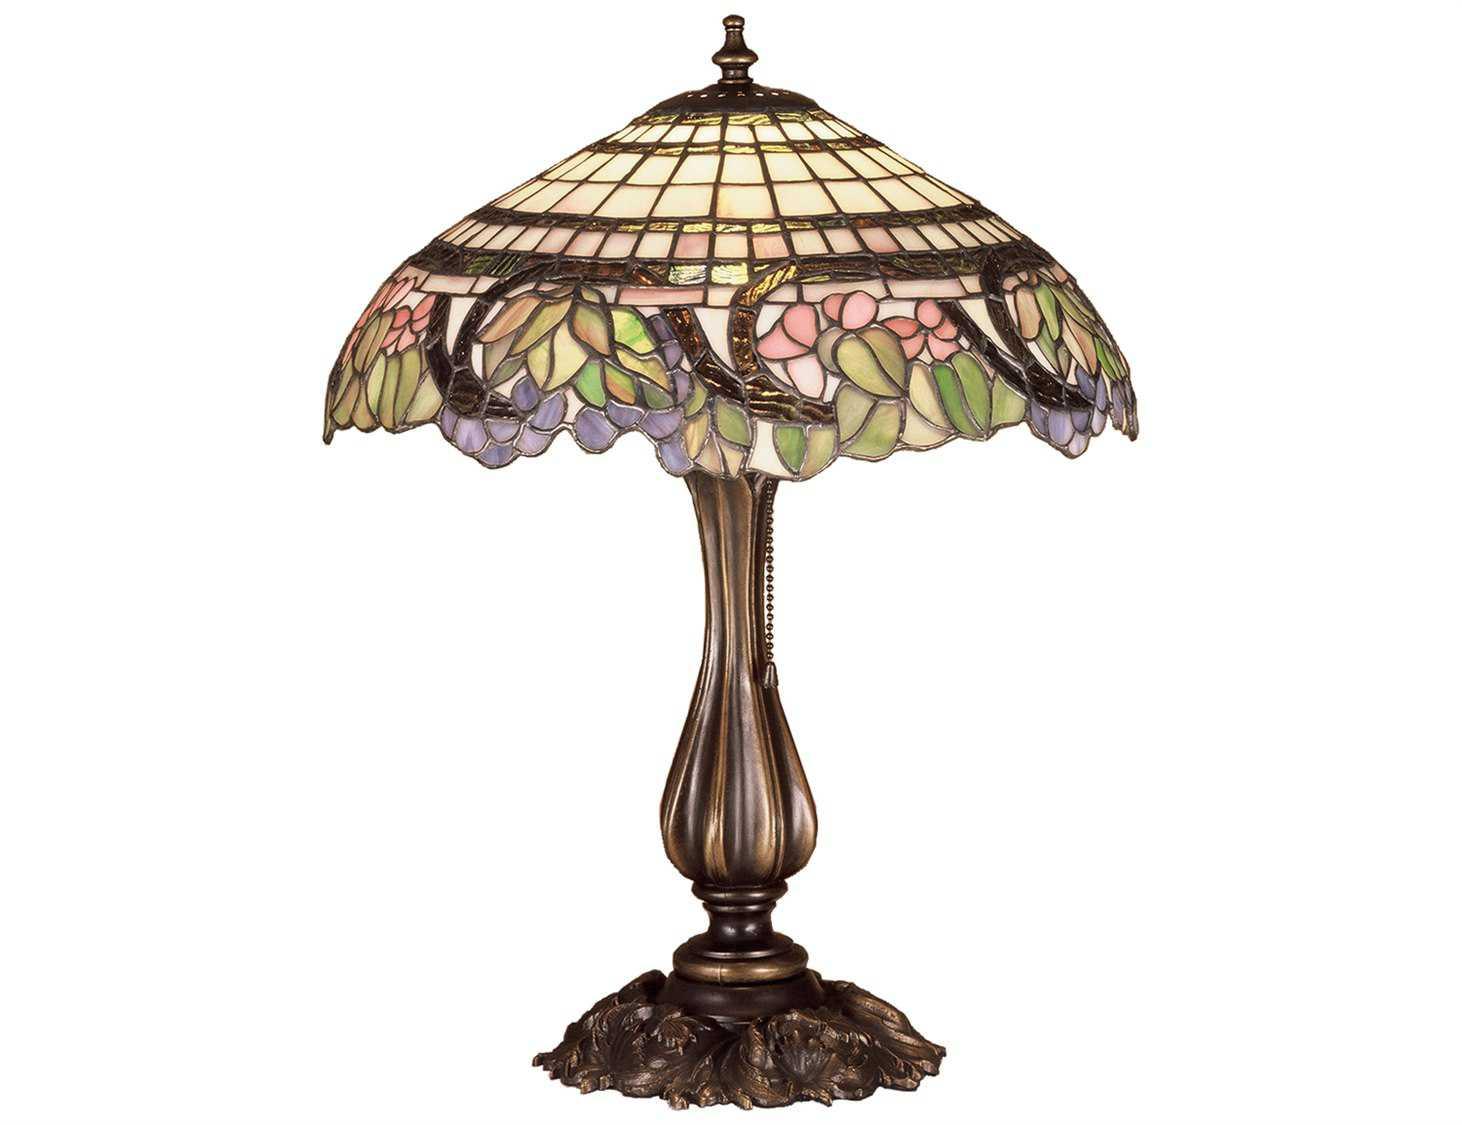 meyda tiffany handel grapevine multi color table lamp 38516. Black Bedroom Furniture Sets. Home Design Ideas